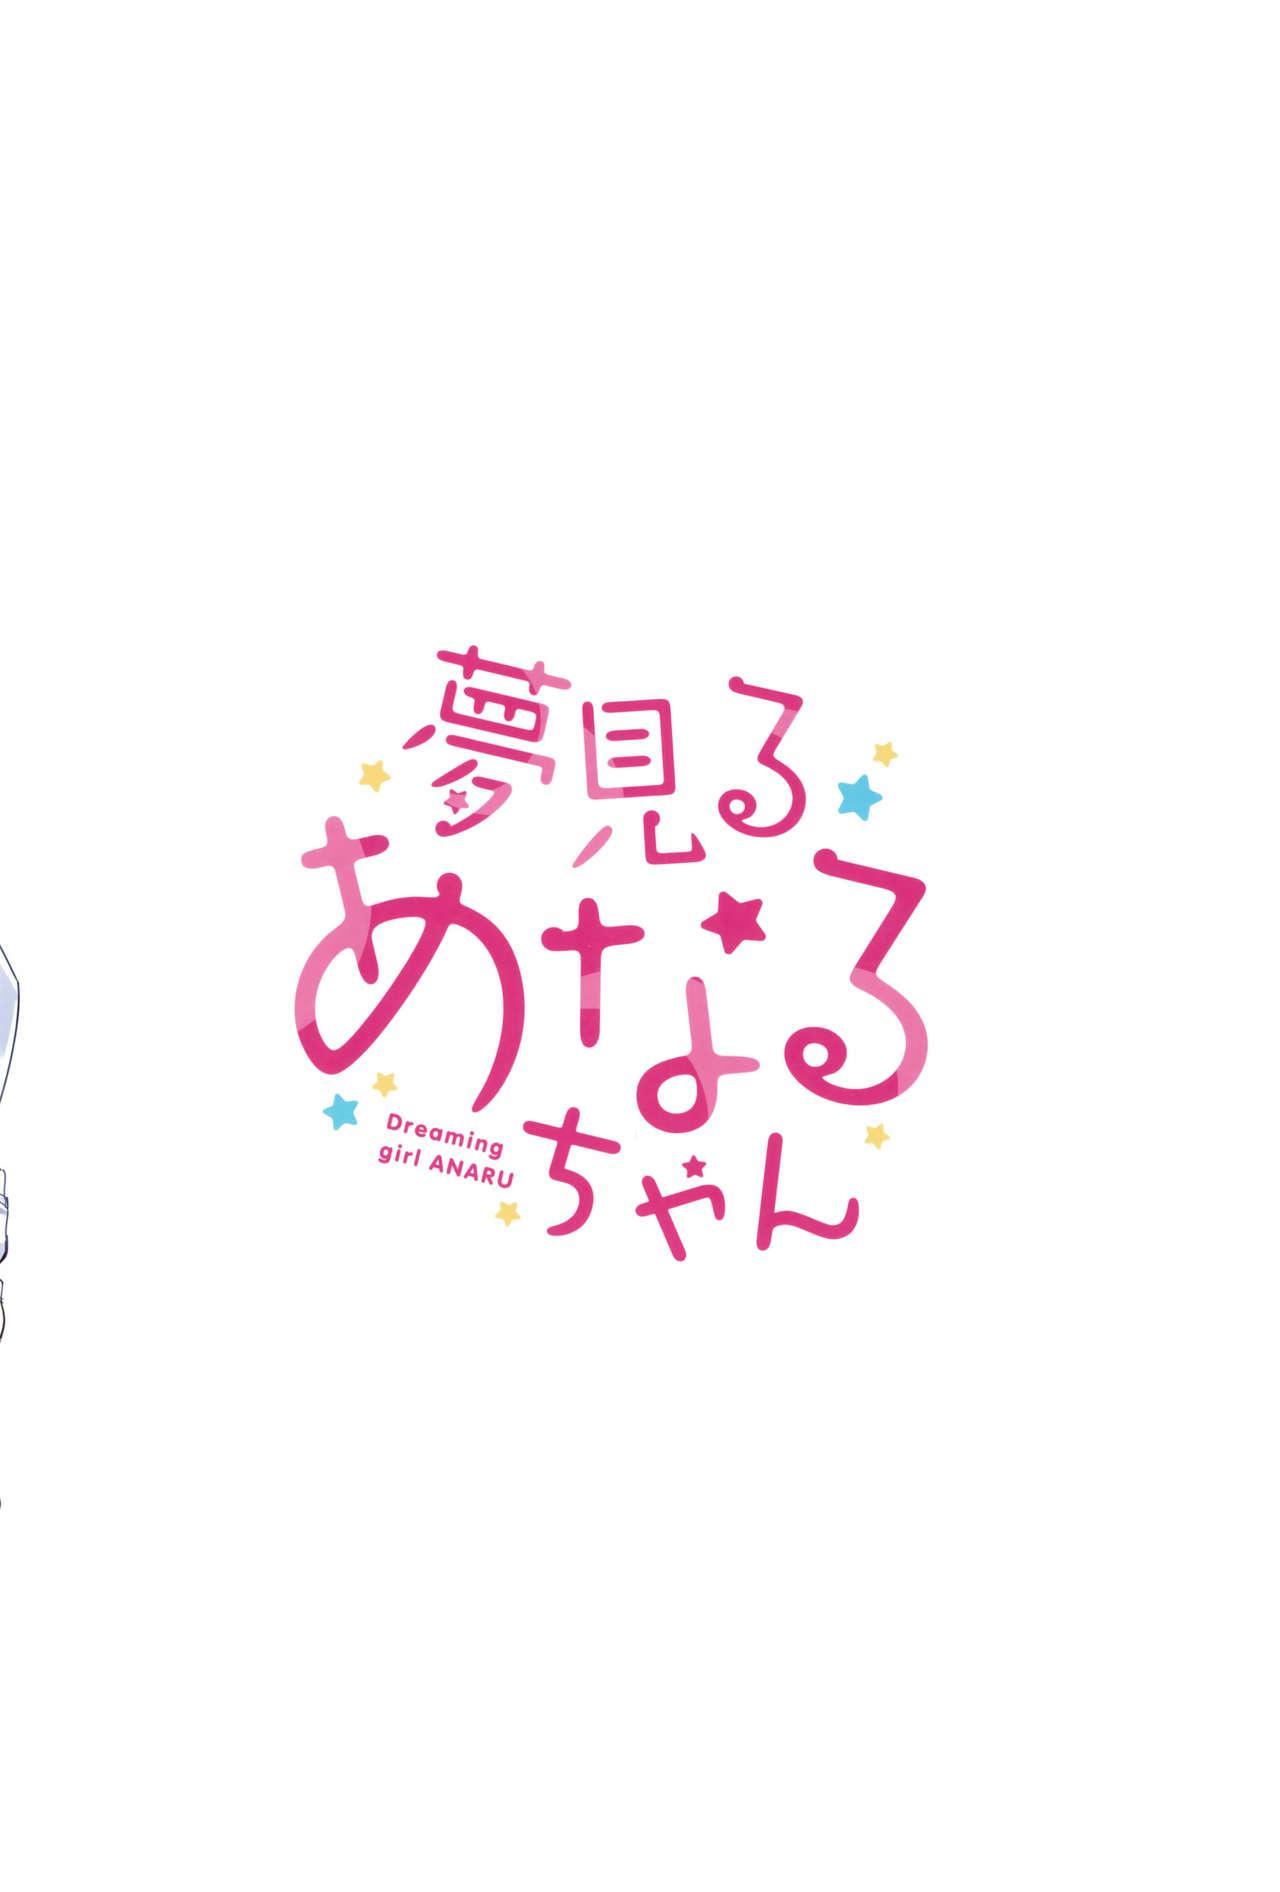 (C95) [Gyuunyuuya-san (Gyuunyuu Nomio)] Yumemiru Anaru-chan - Dreaming Girl ANARU [Chinese] [绅士仓库汉化] 20